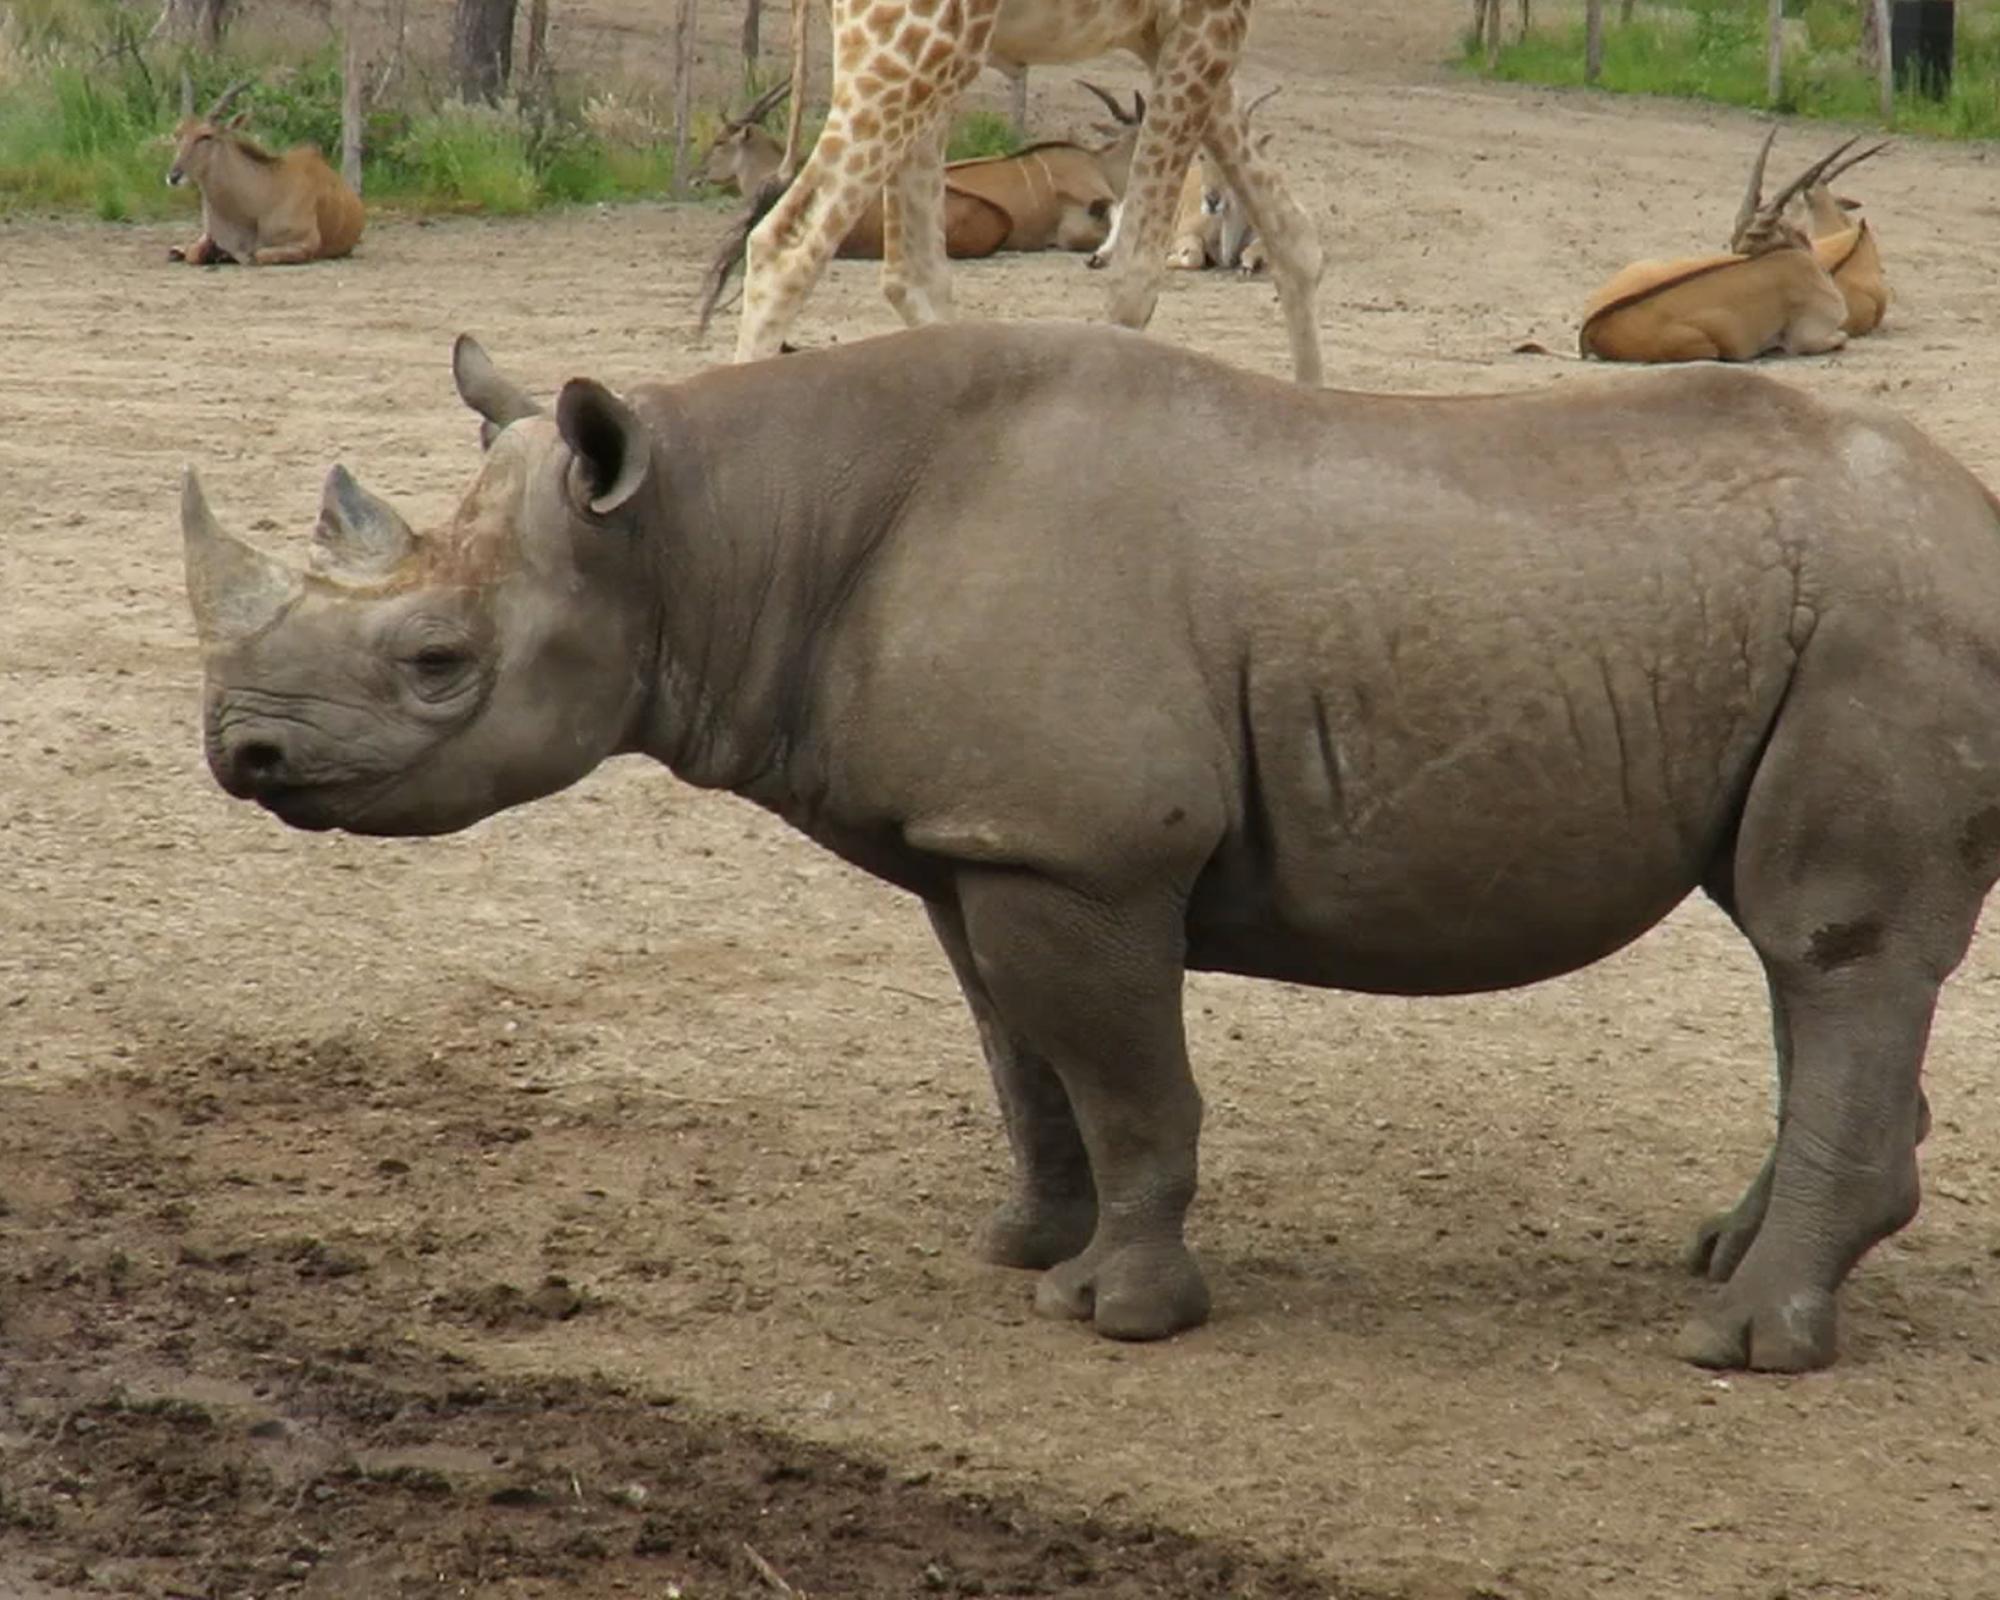 safaripark-beekse-bergen-zwarte-neushoorn-still-2000x1600.jpg